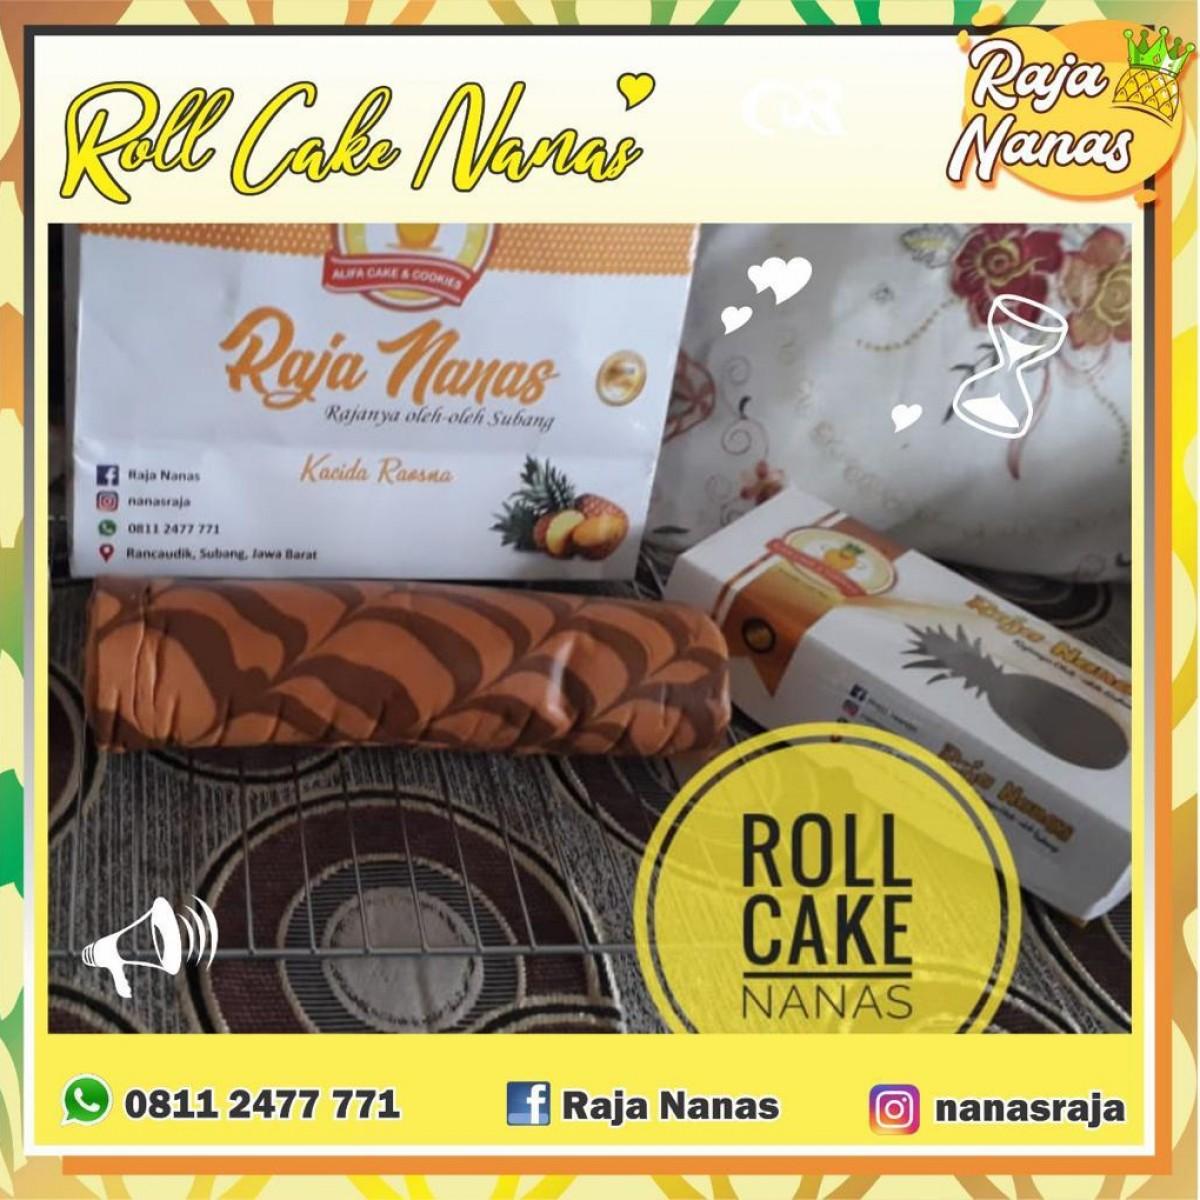 Roll cake nanas